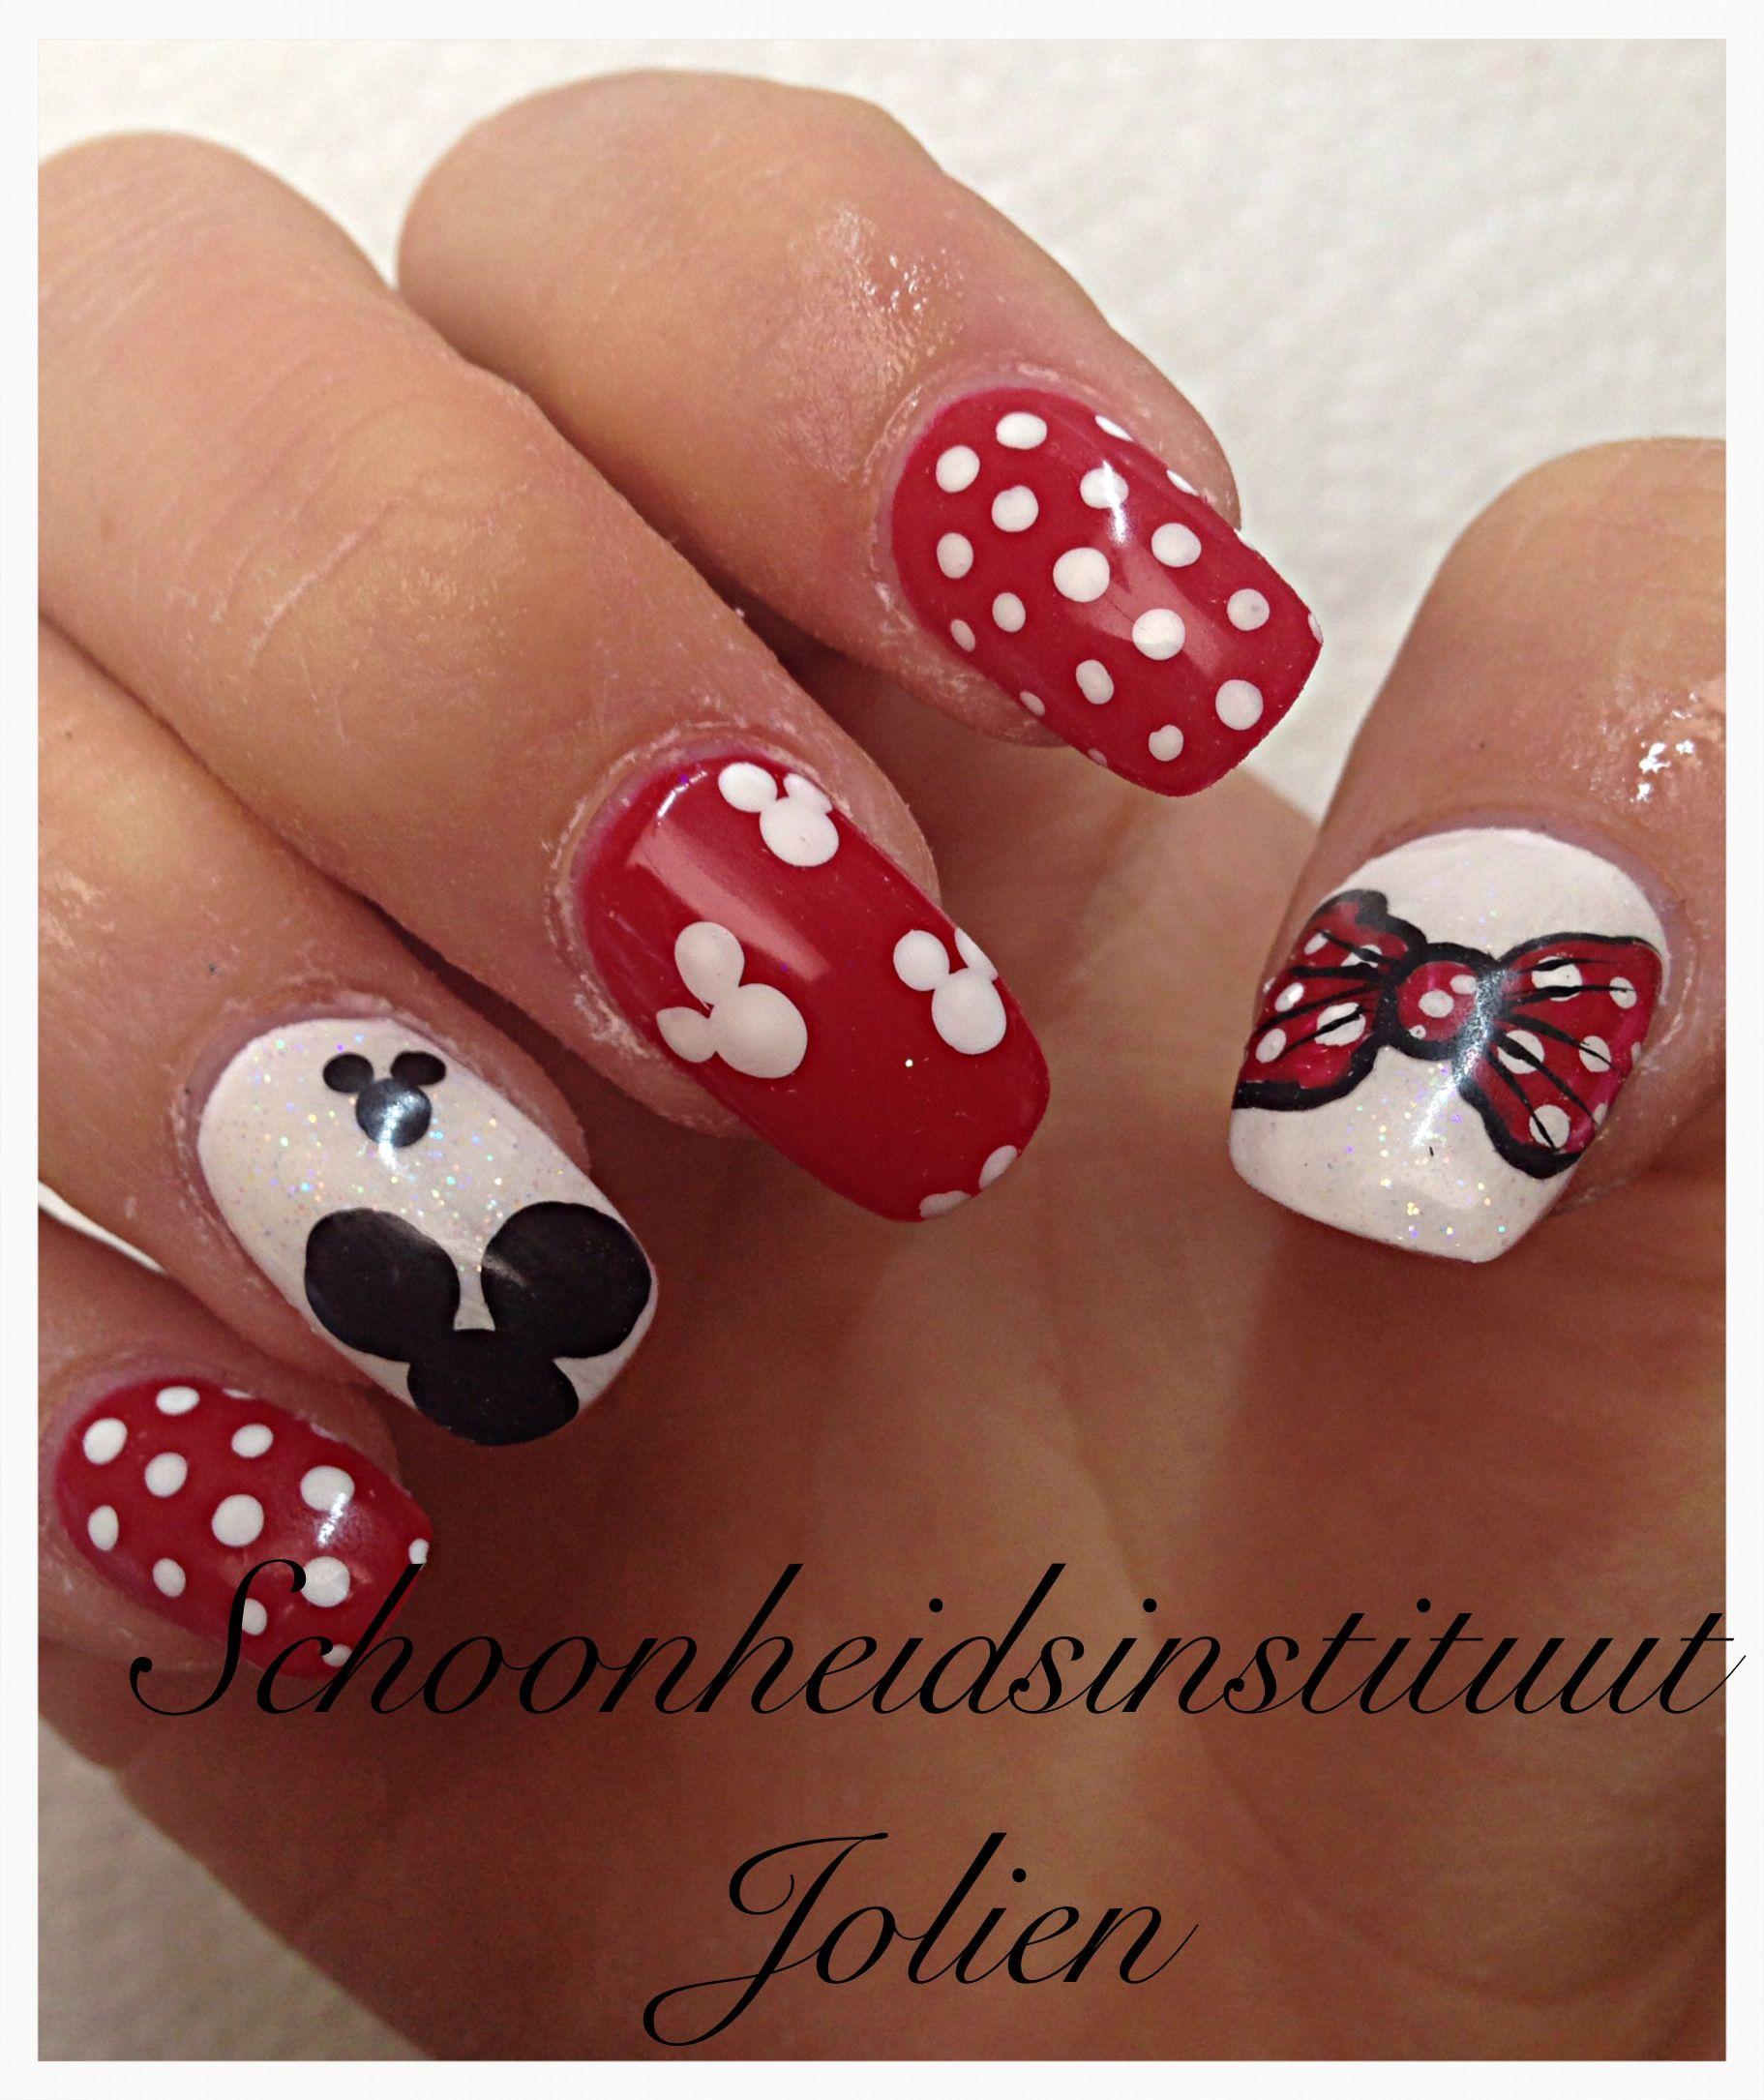 My work Disney. Schoonheidsinstituut Jolien - Nagels, nail-art / my ...